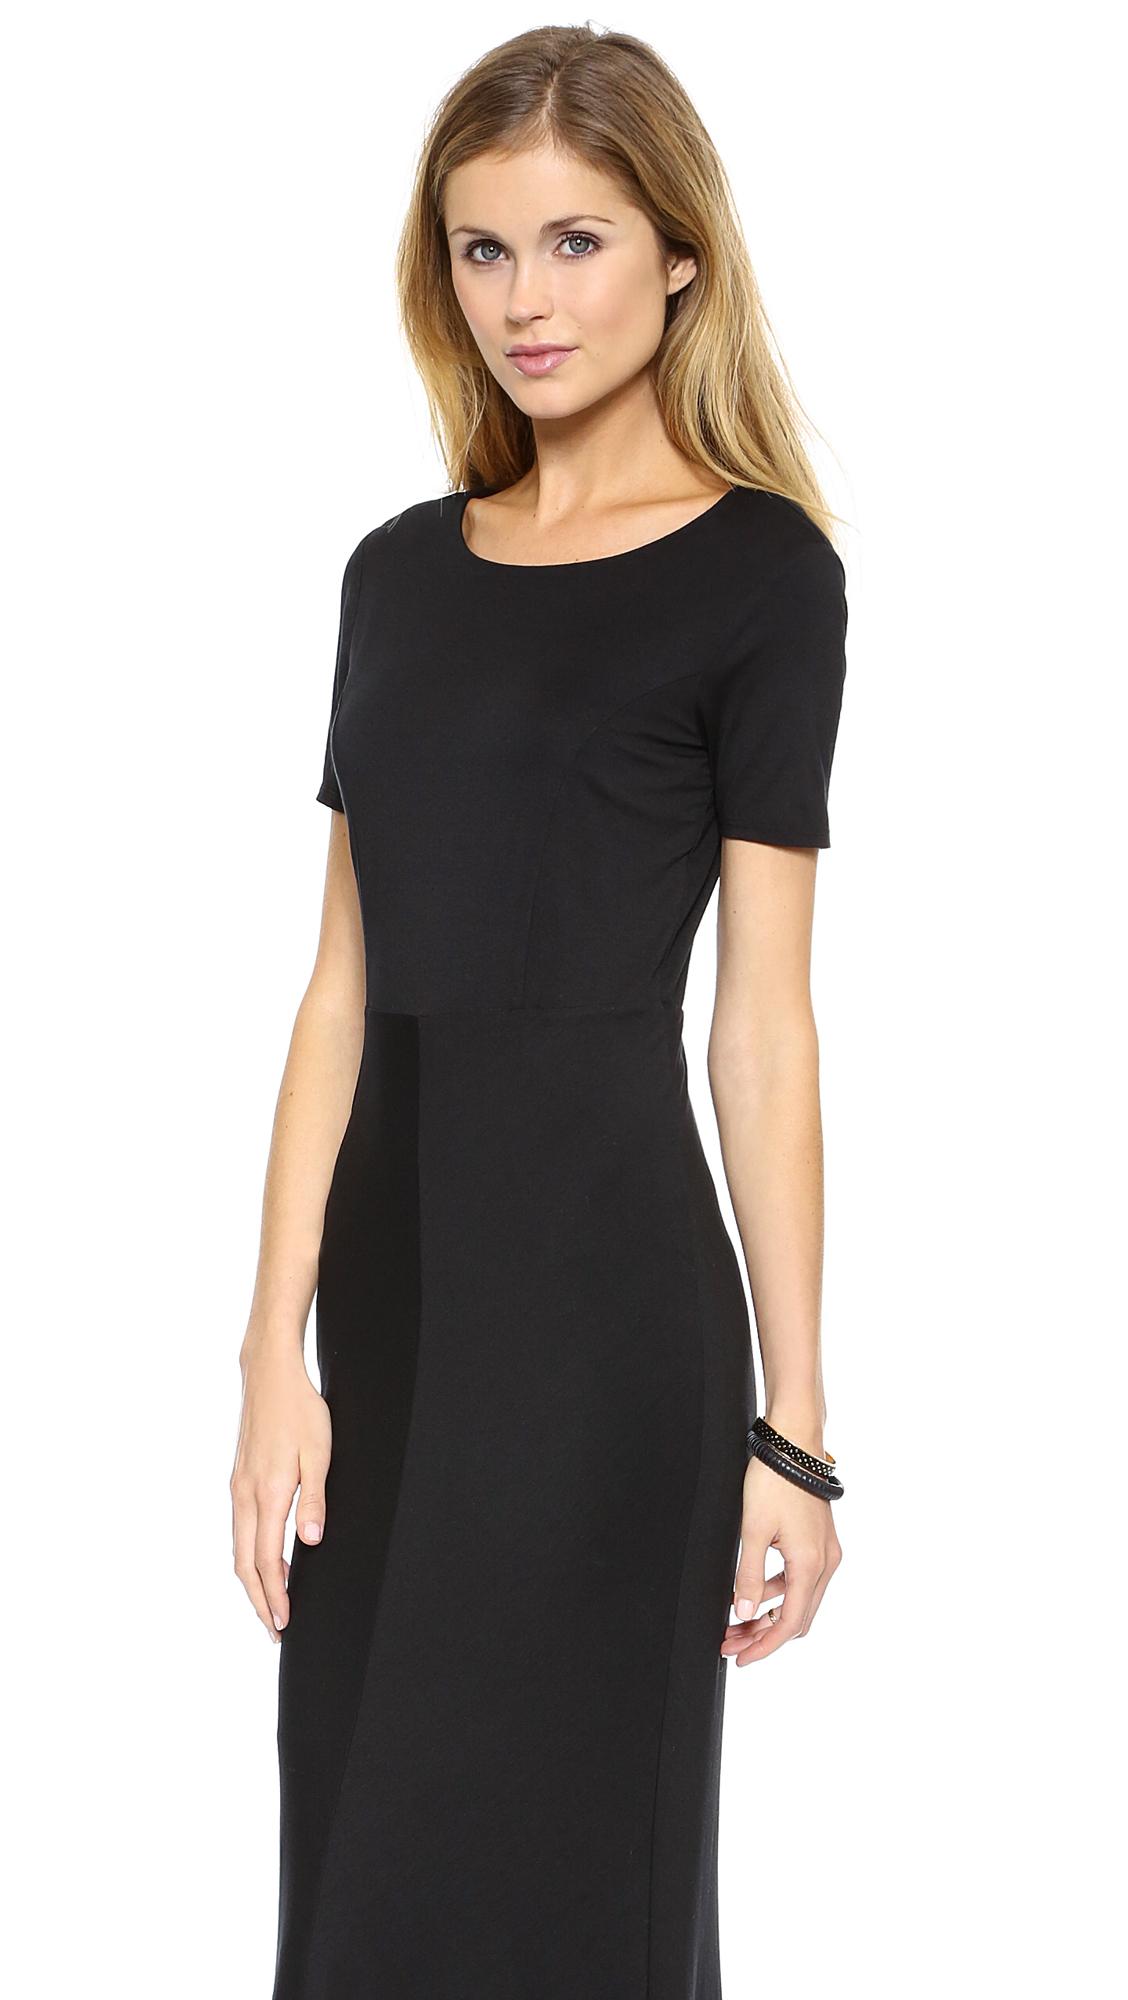 three dots black short sleeve maxi dress black product 1 21767319 0 031285962 normal